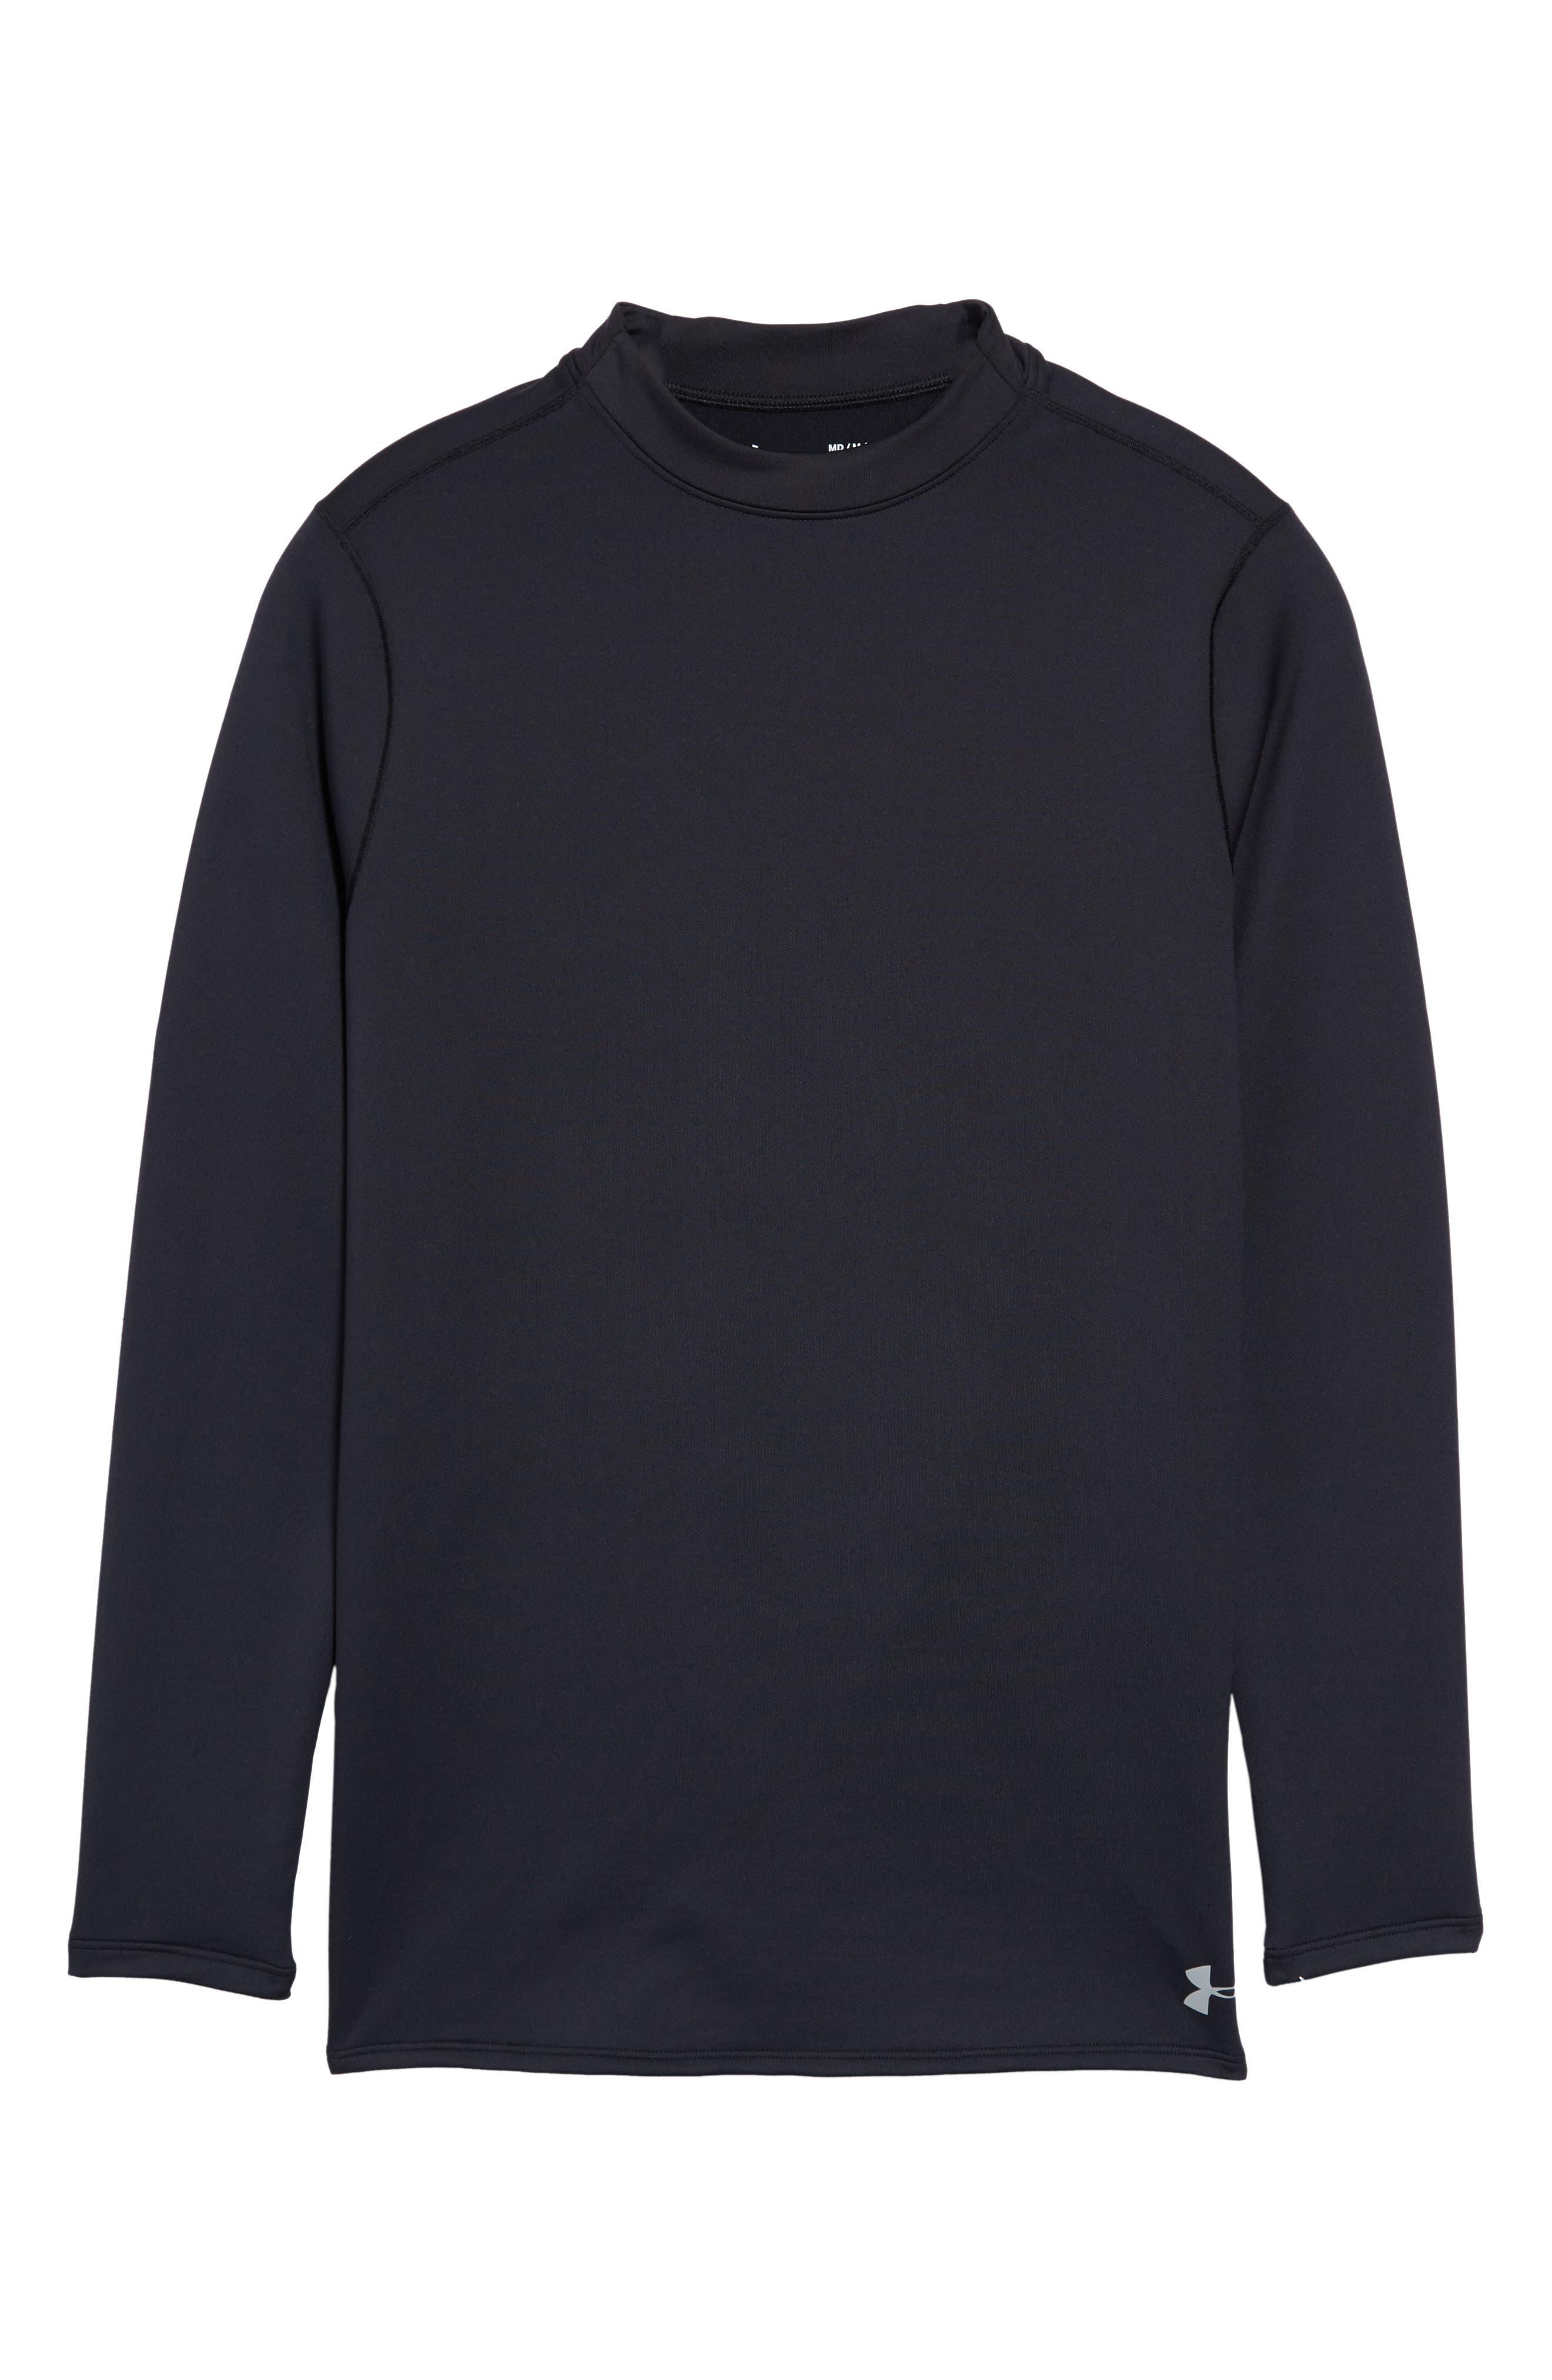 ColdGear<sup>®</sup> Mock Neck Long Sleeve T-Shirt,                             Alternate thumbnail 6, color,                             BLACK/ STEEL